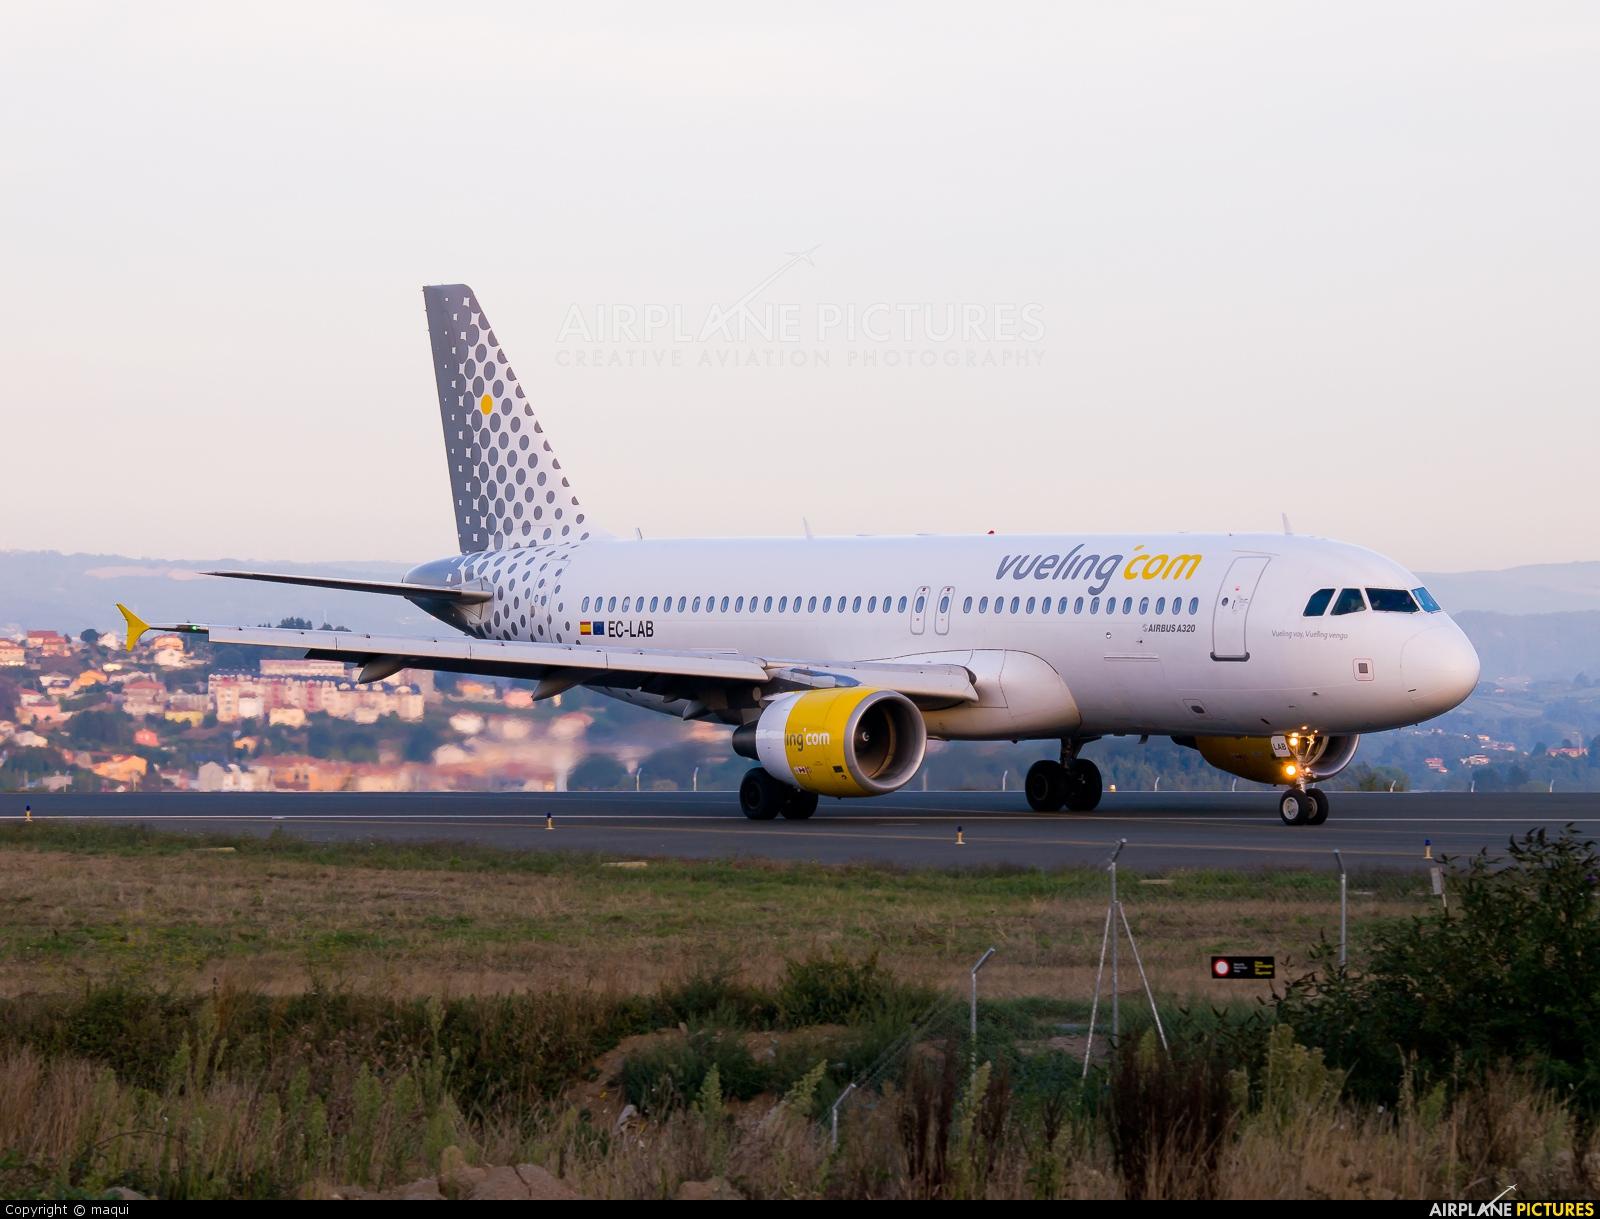 Vueling Airlines EC-LAB aircraft at La Coruña